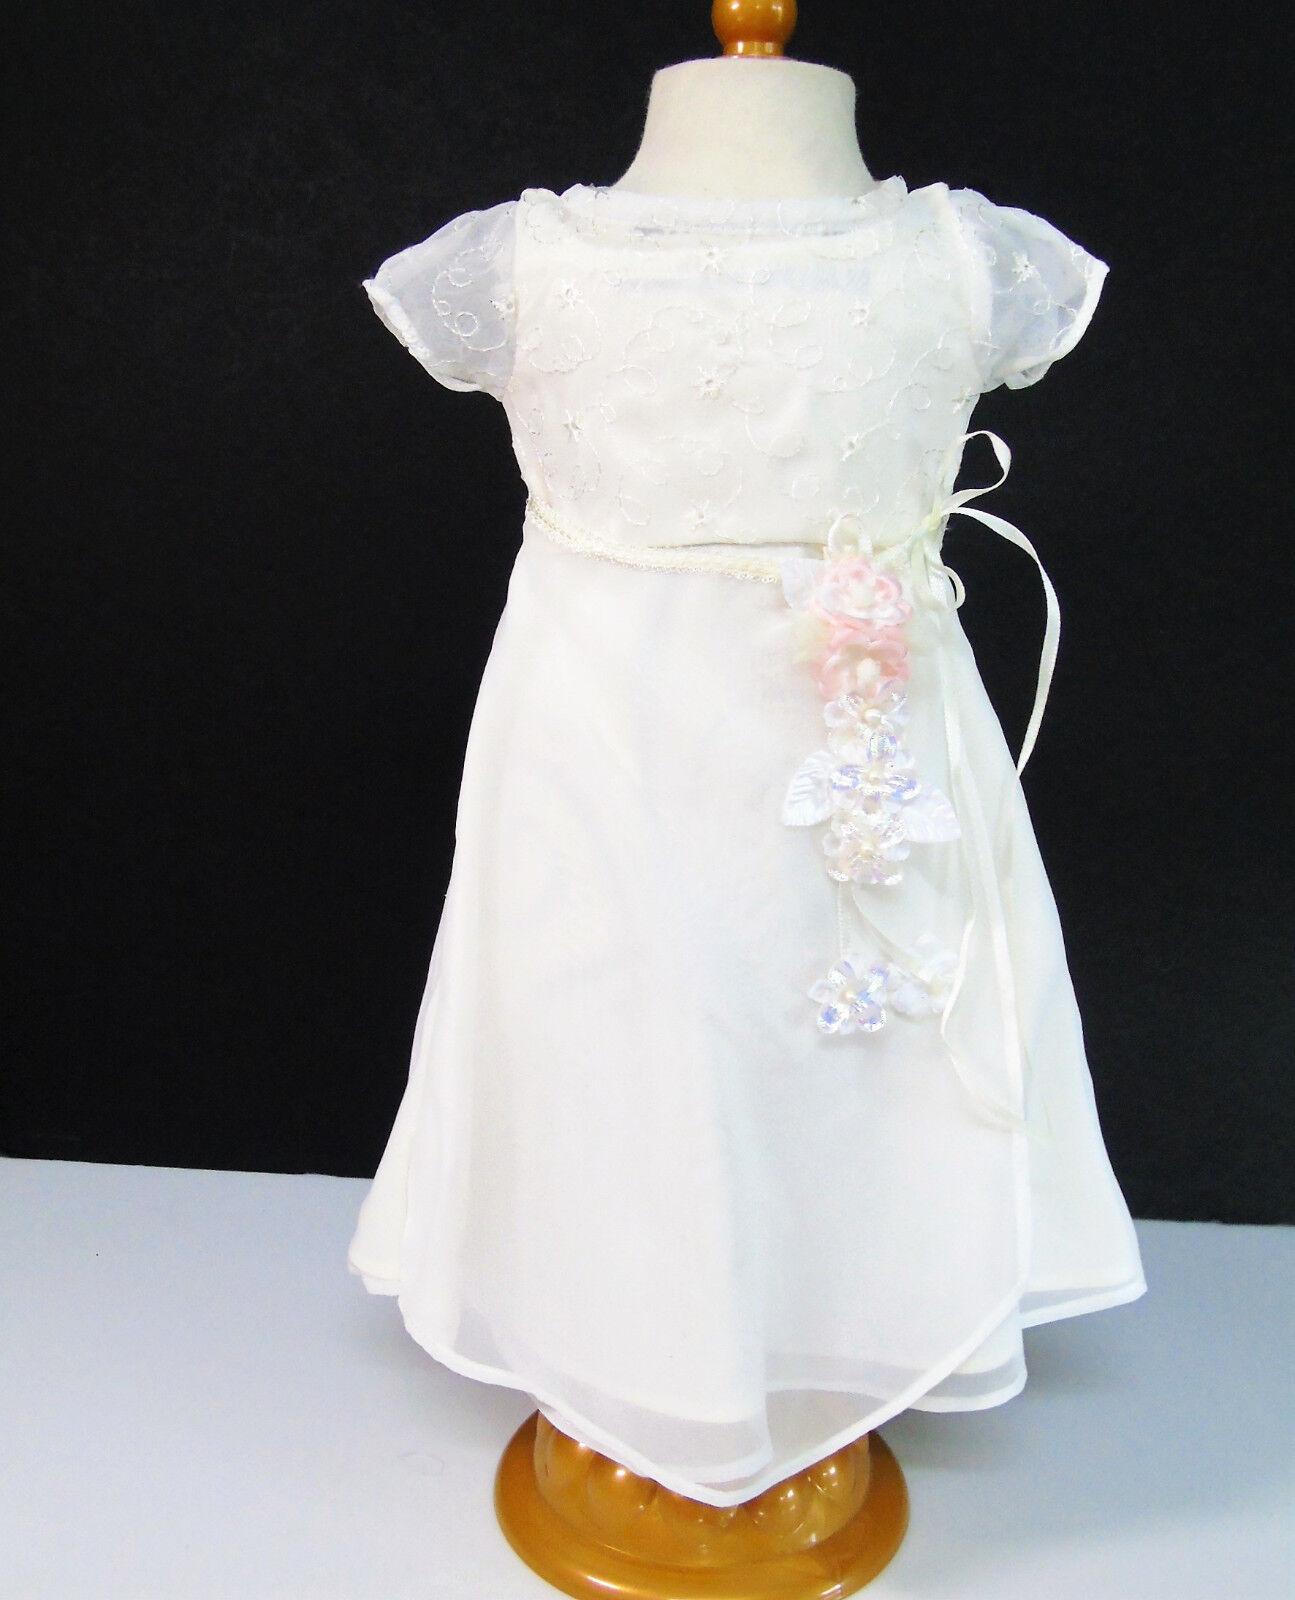 American Girl Bambola Memorable Moments Costume Garden Party Damigella Recital